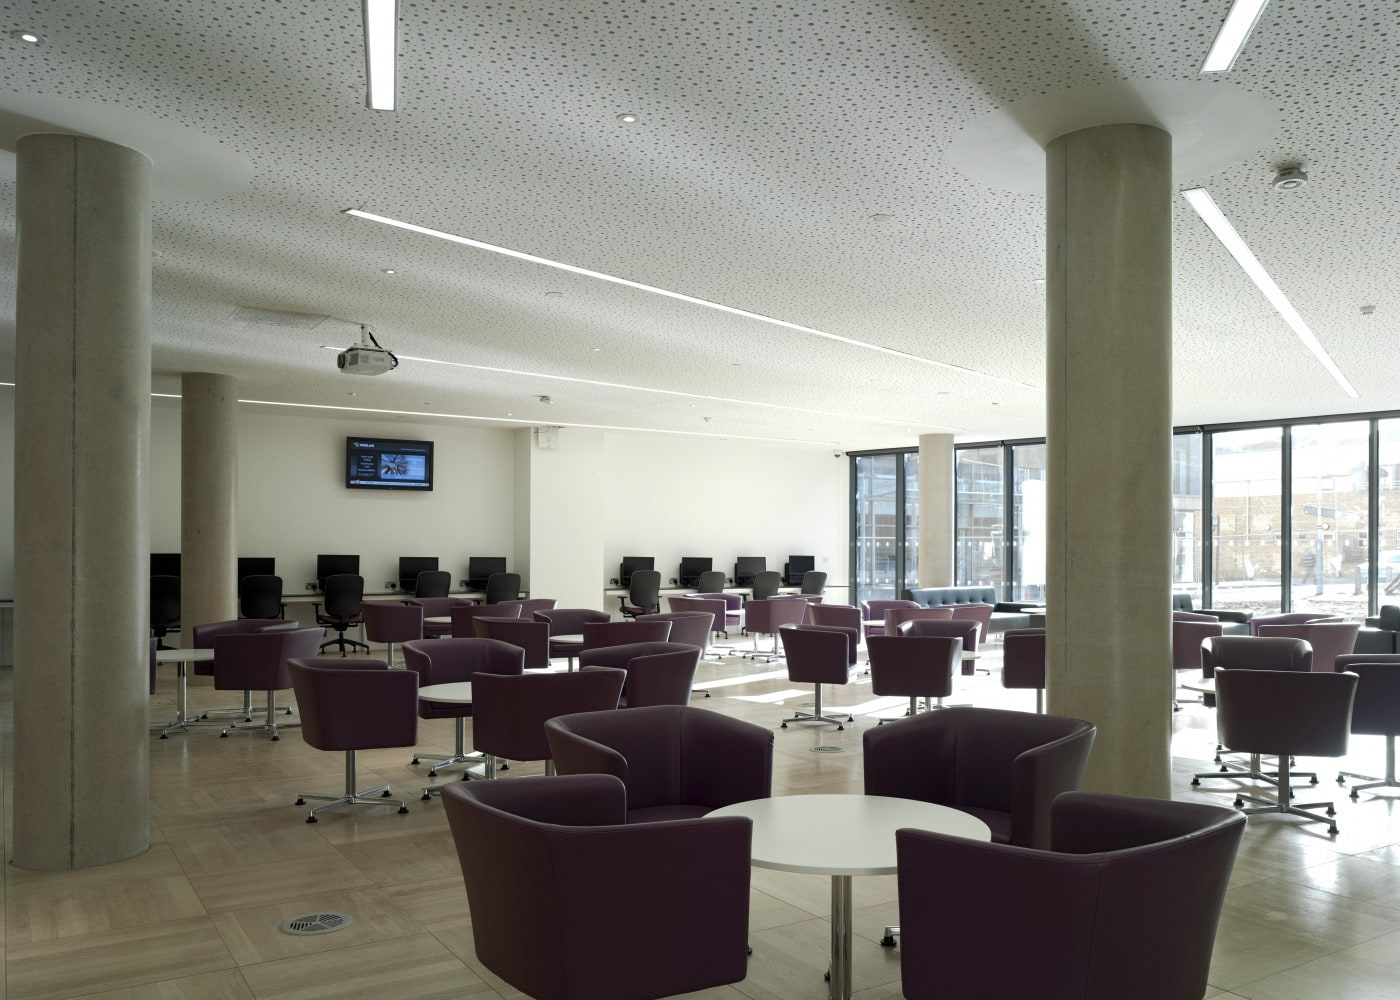 education lighting: University of Bedfordshire seating area